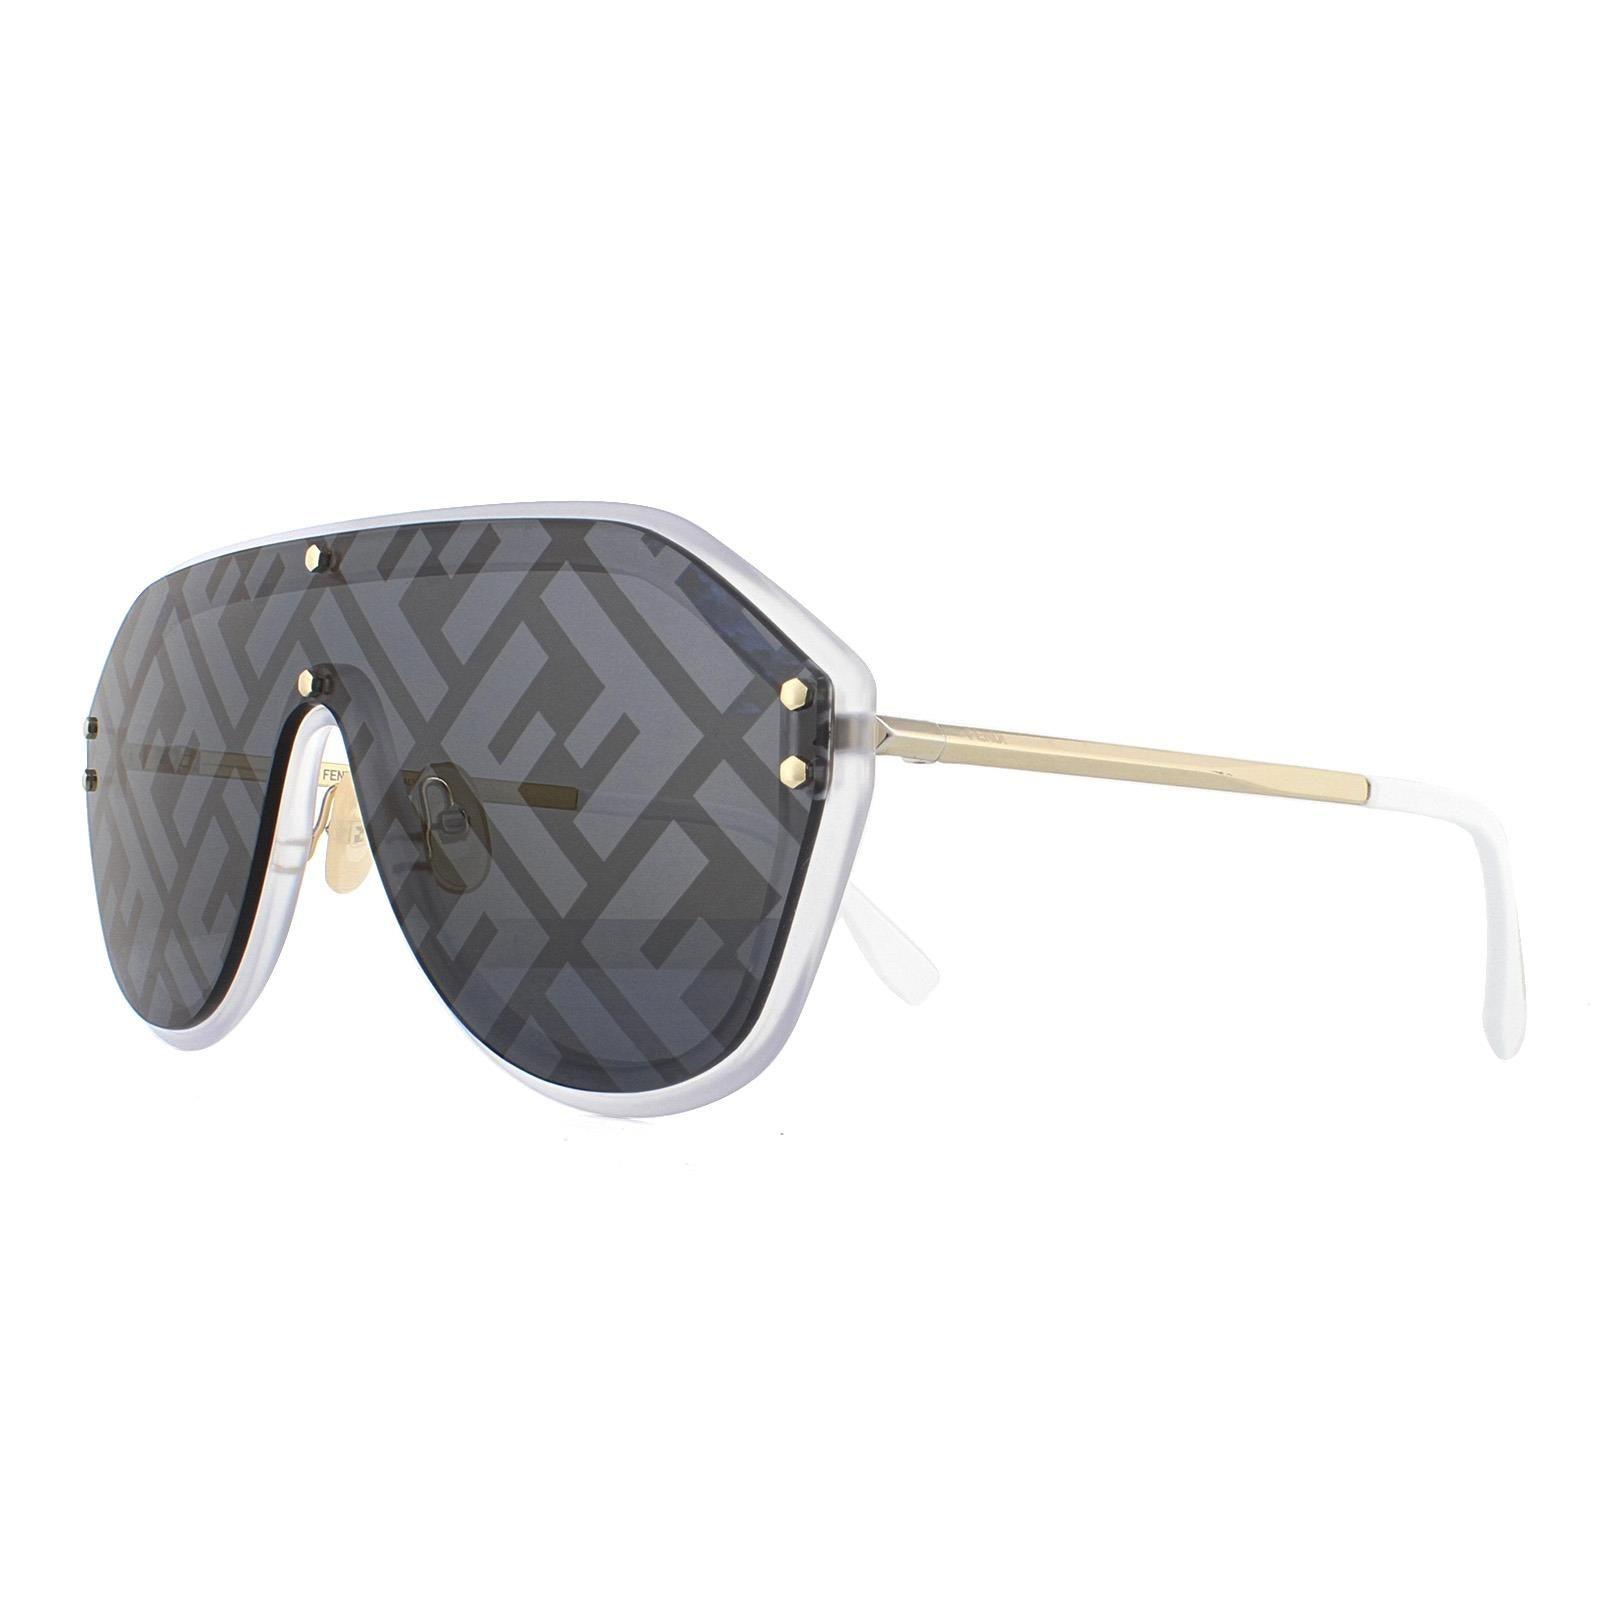 Fendi Sunglasses M0039/G/S 83I 7R Gold Silver Monogram Blue Silver